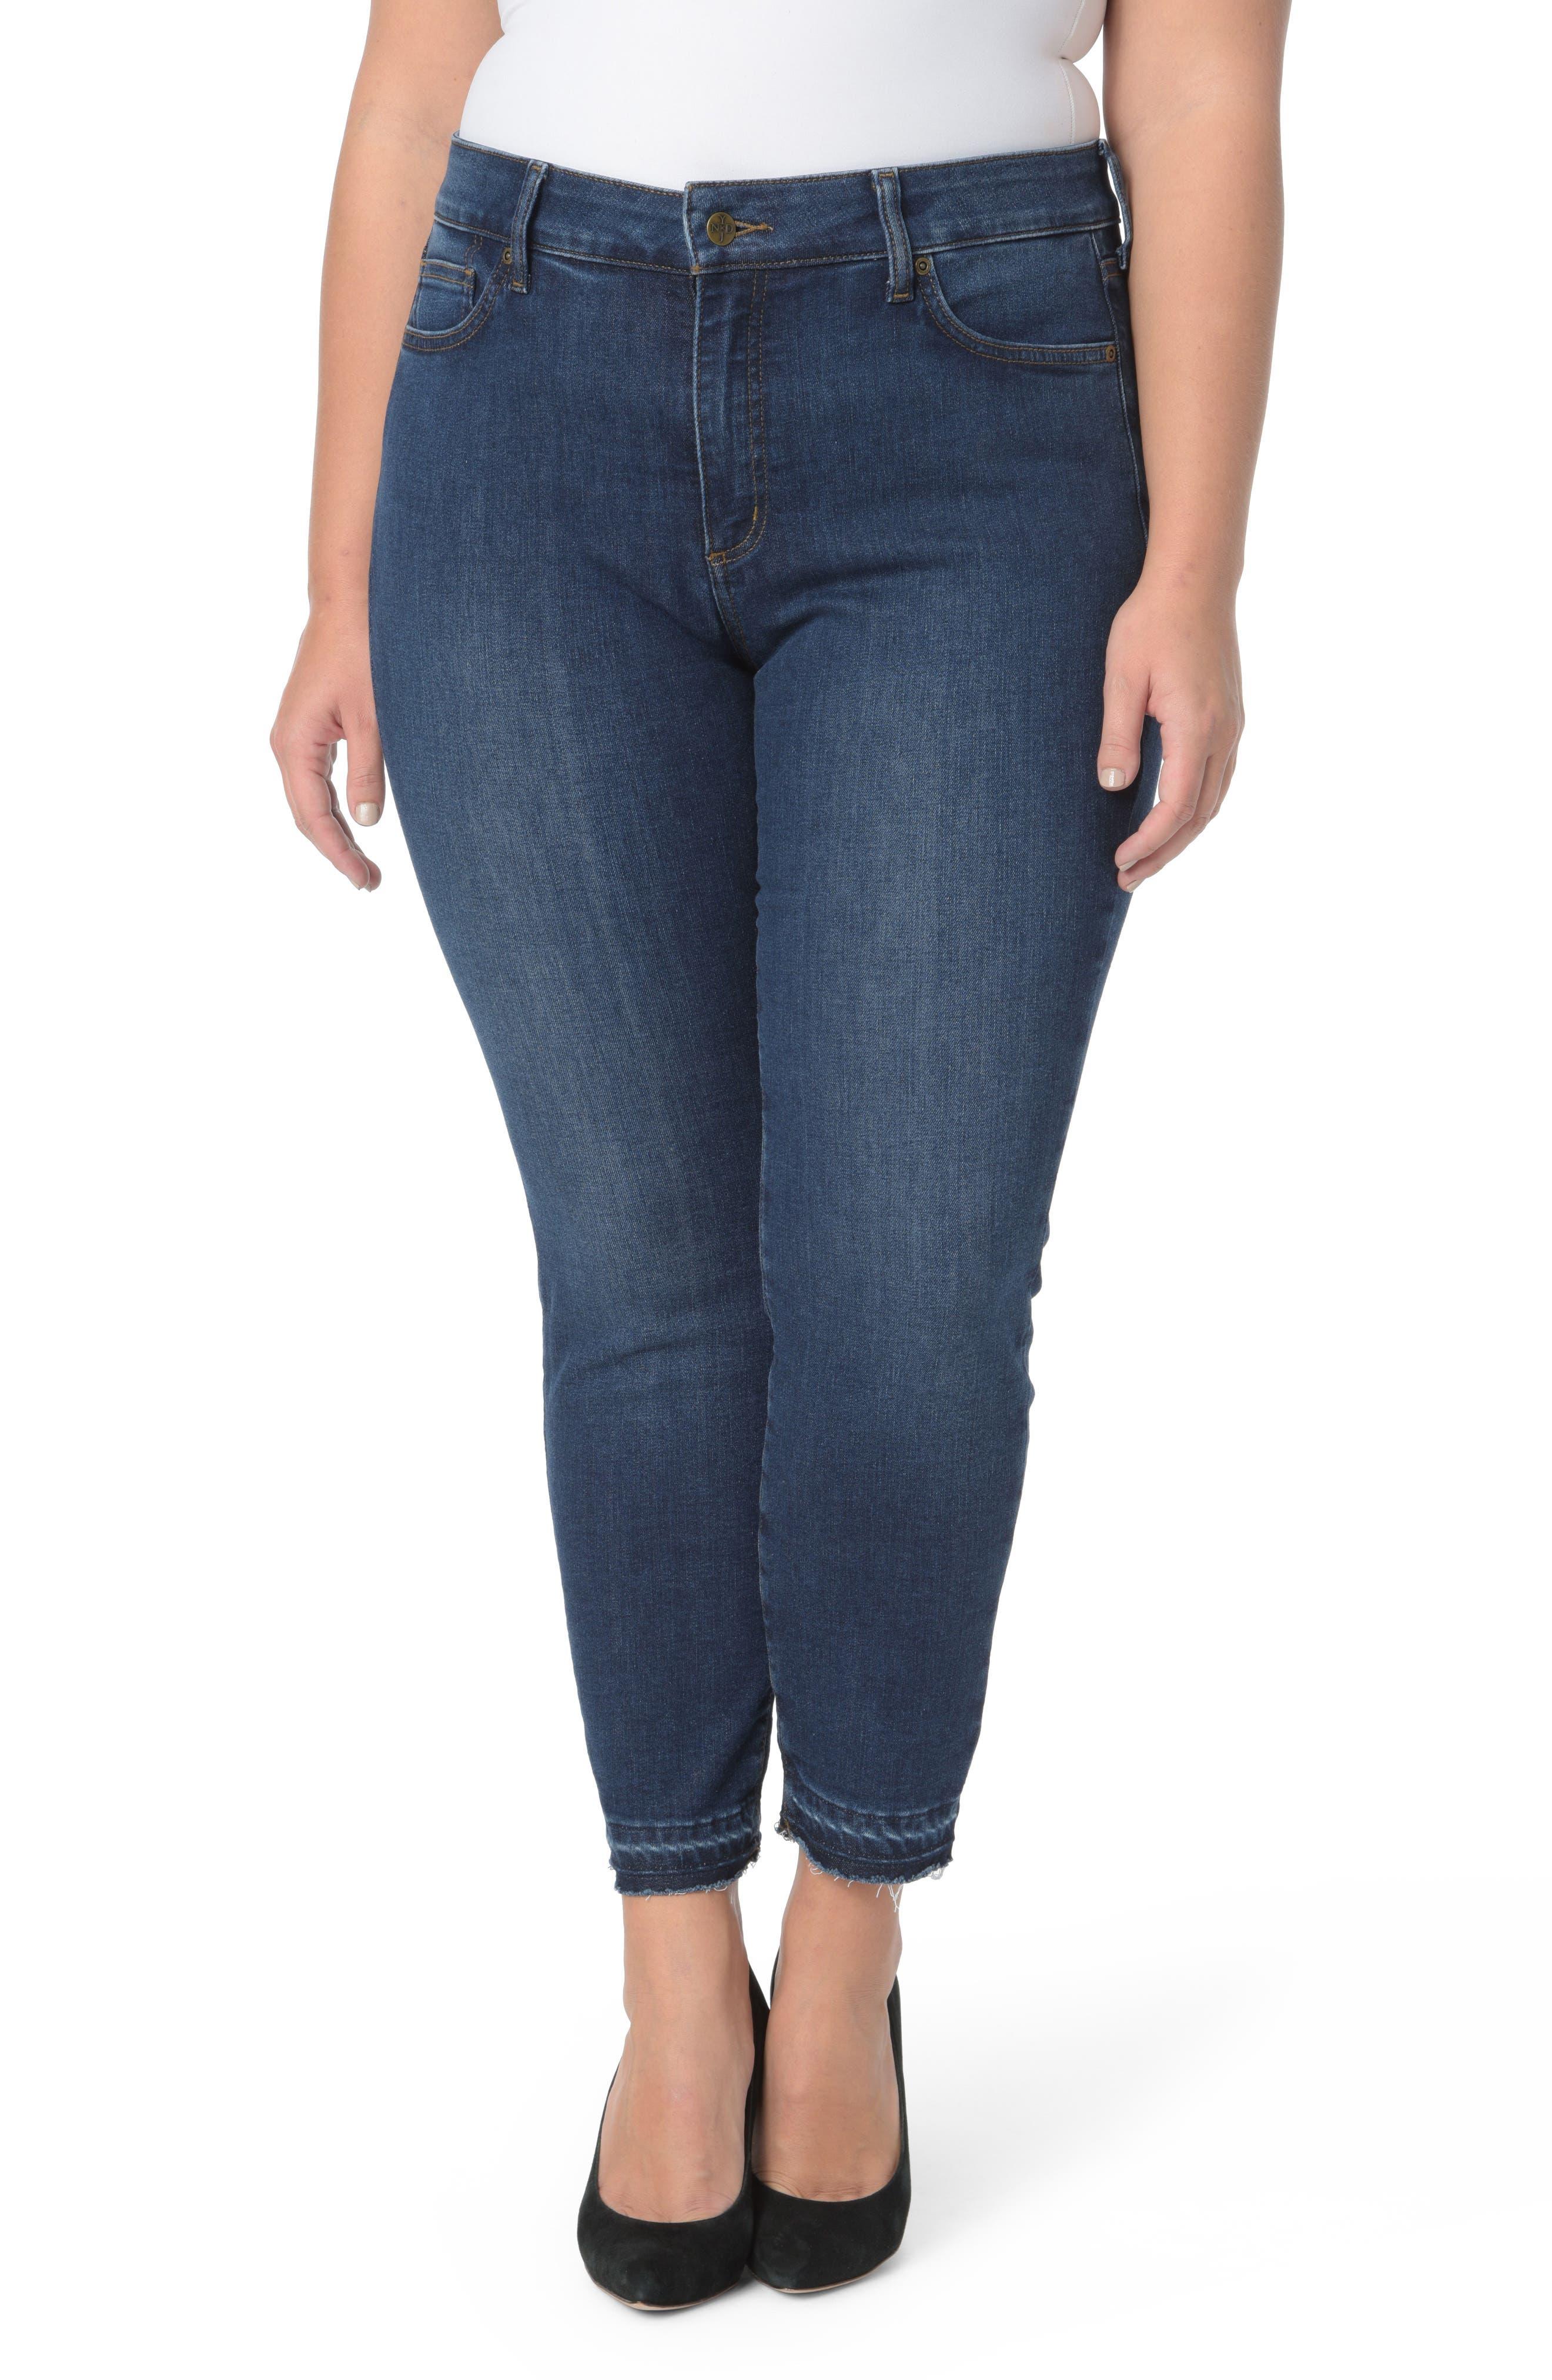 NYDJ Alina Release Hem Ankle Jeans (Cooper) (Plus Size)